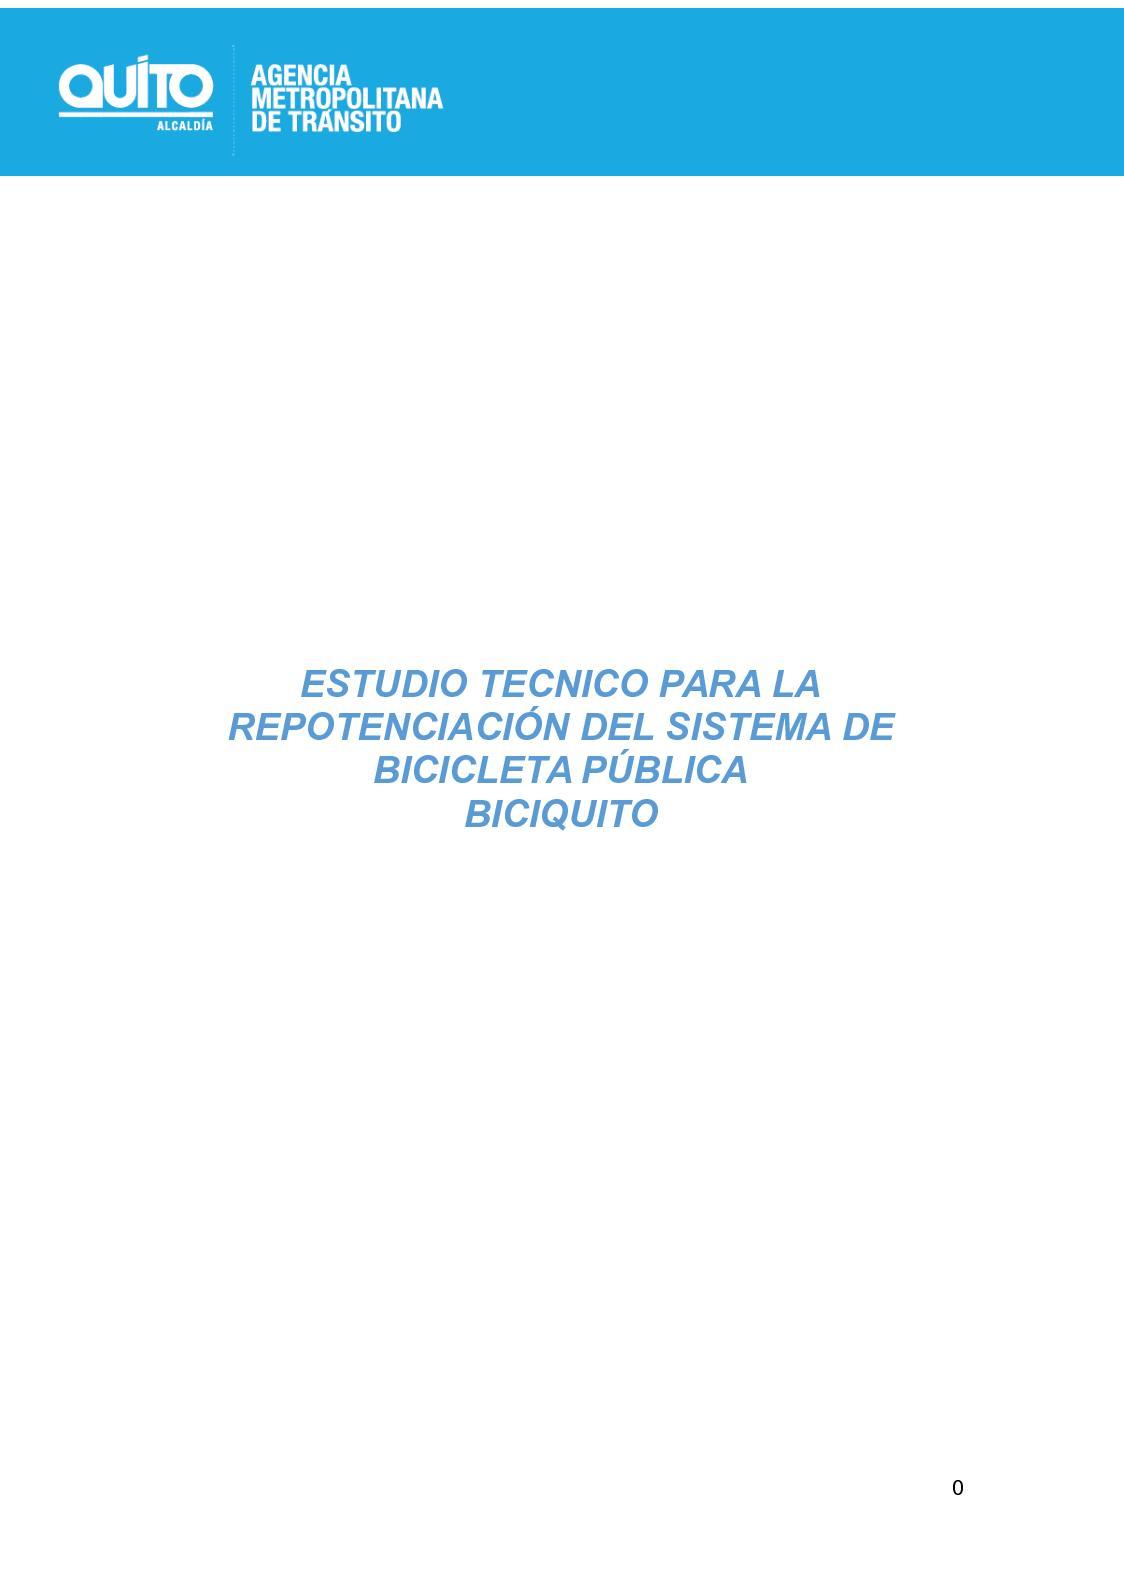 Estudio Tecnico Repotenciacion Bicicleta Publica Biciquito